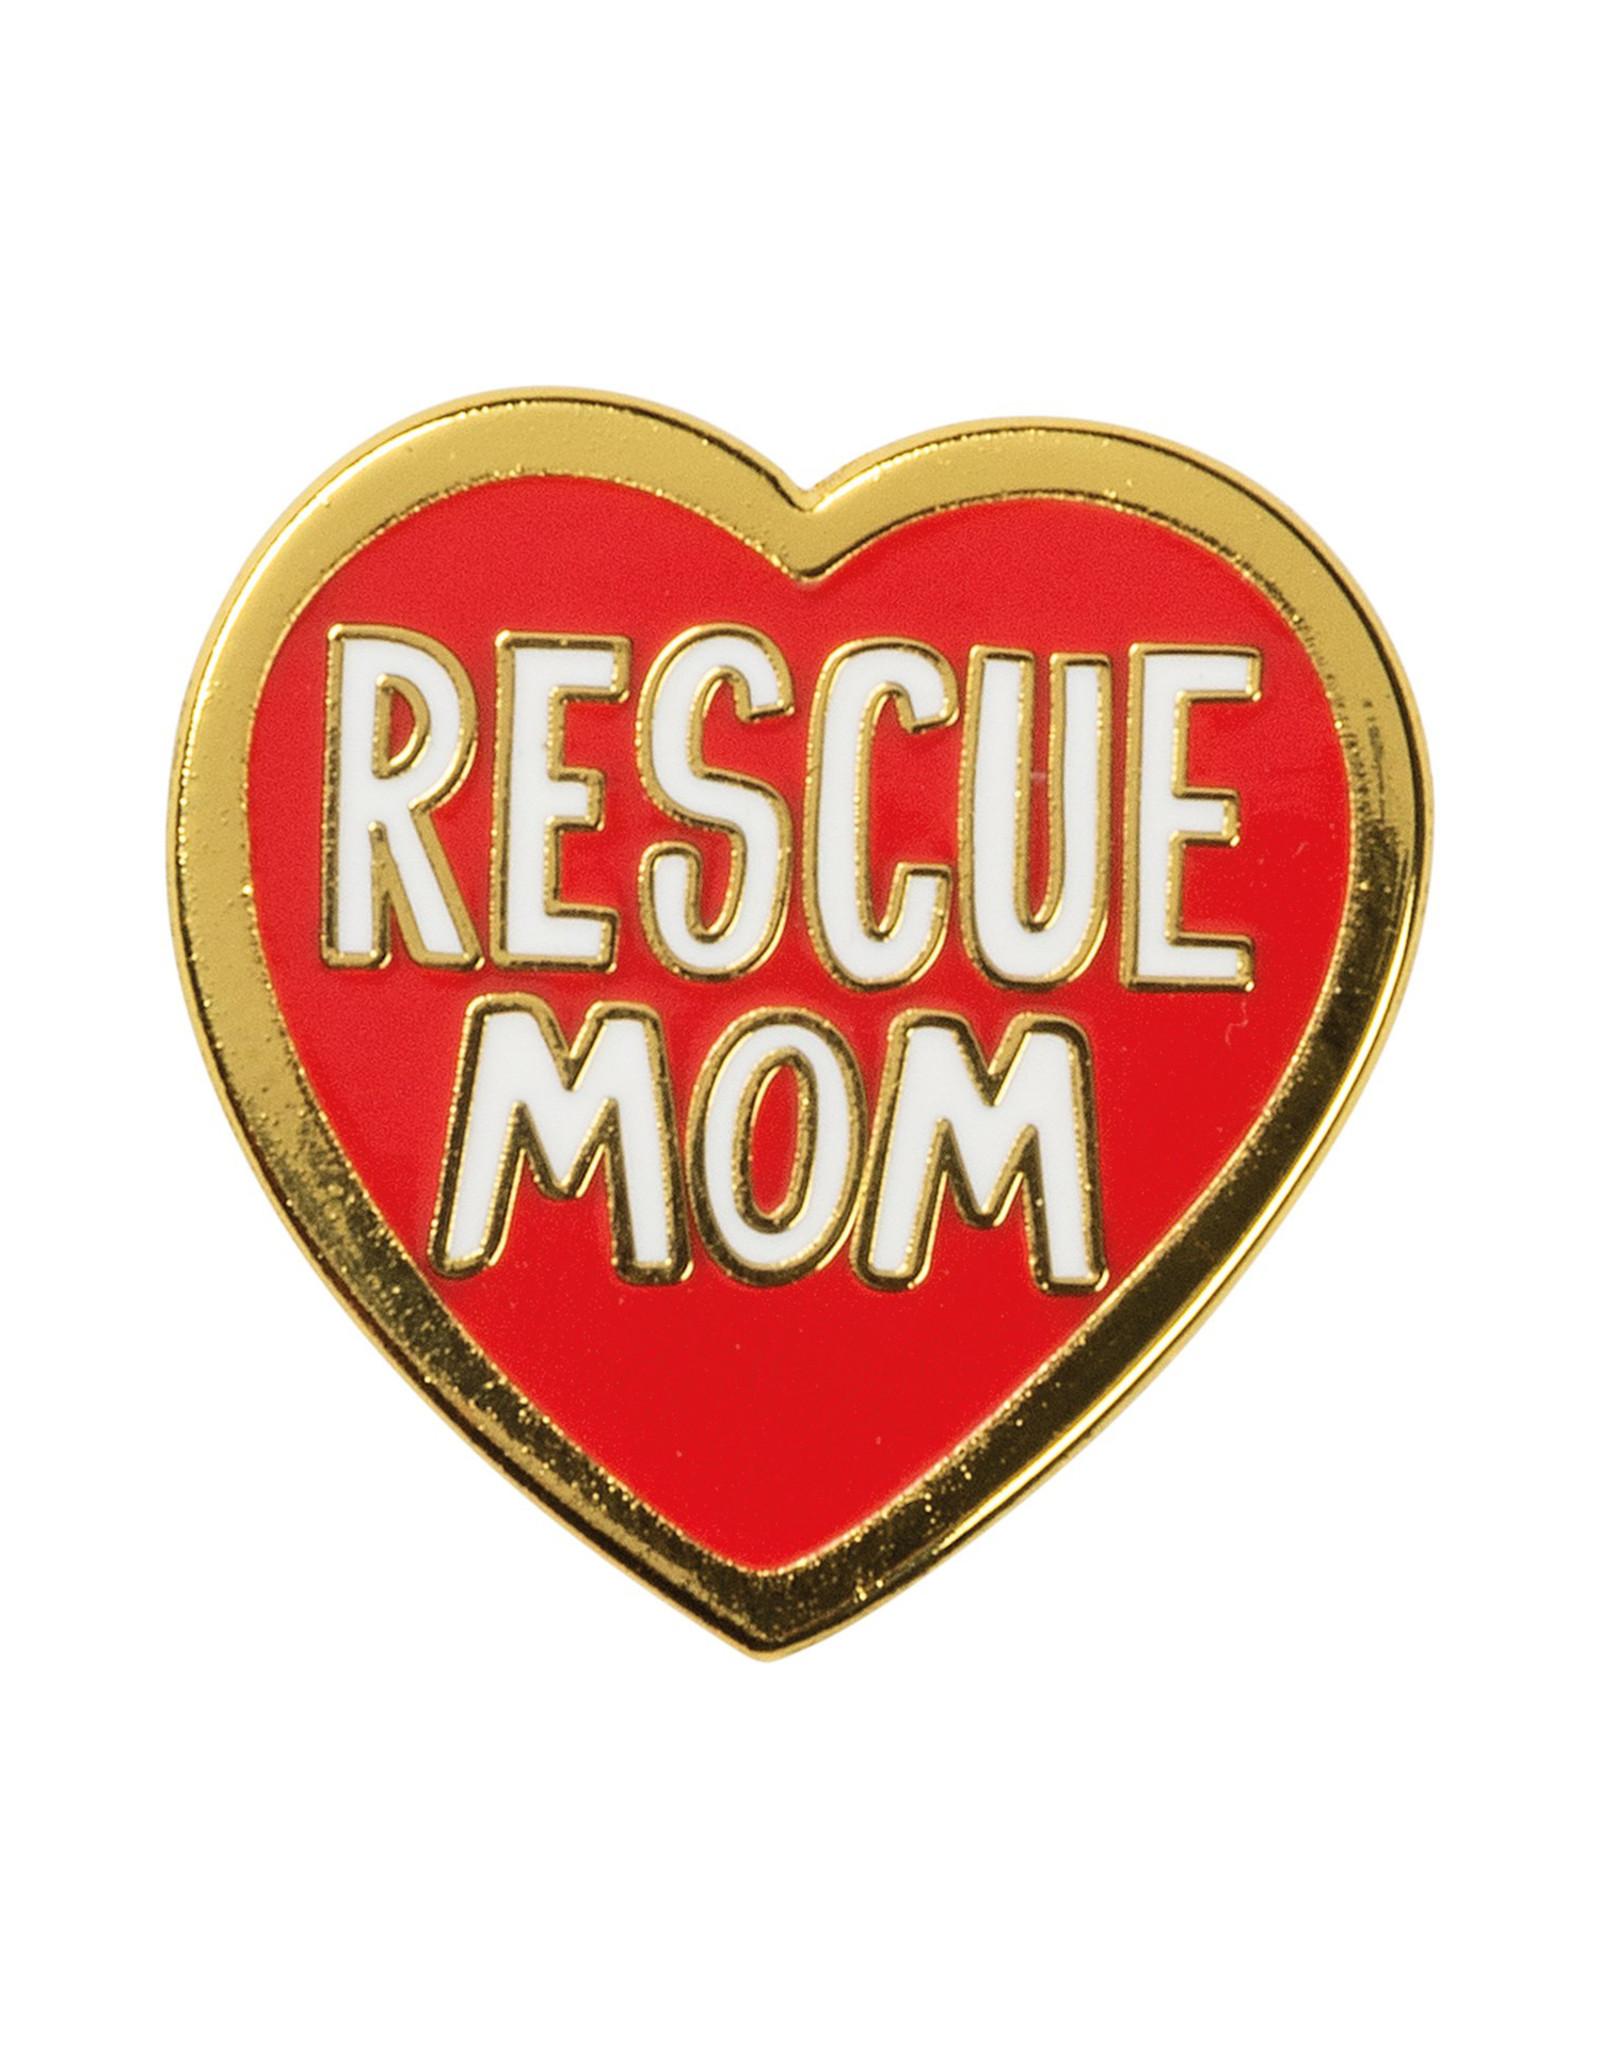 Rescue Mom Enamel Pin